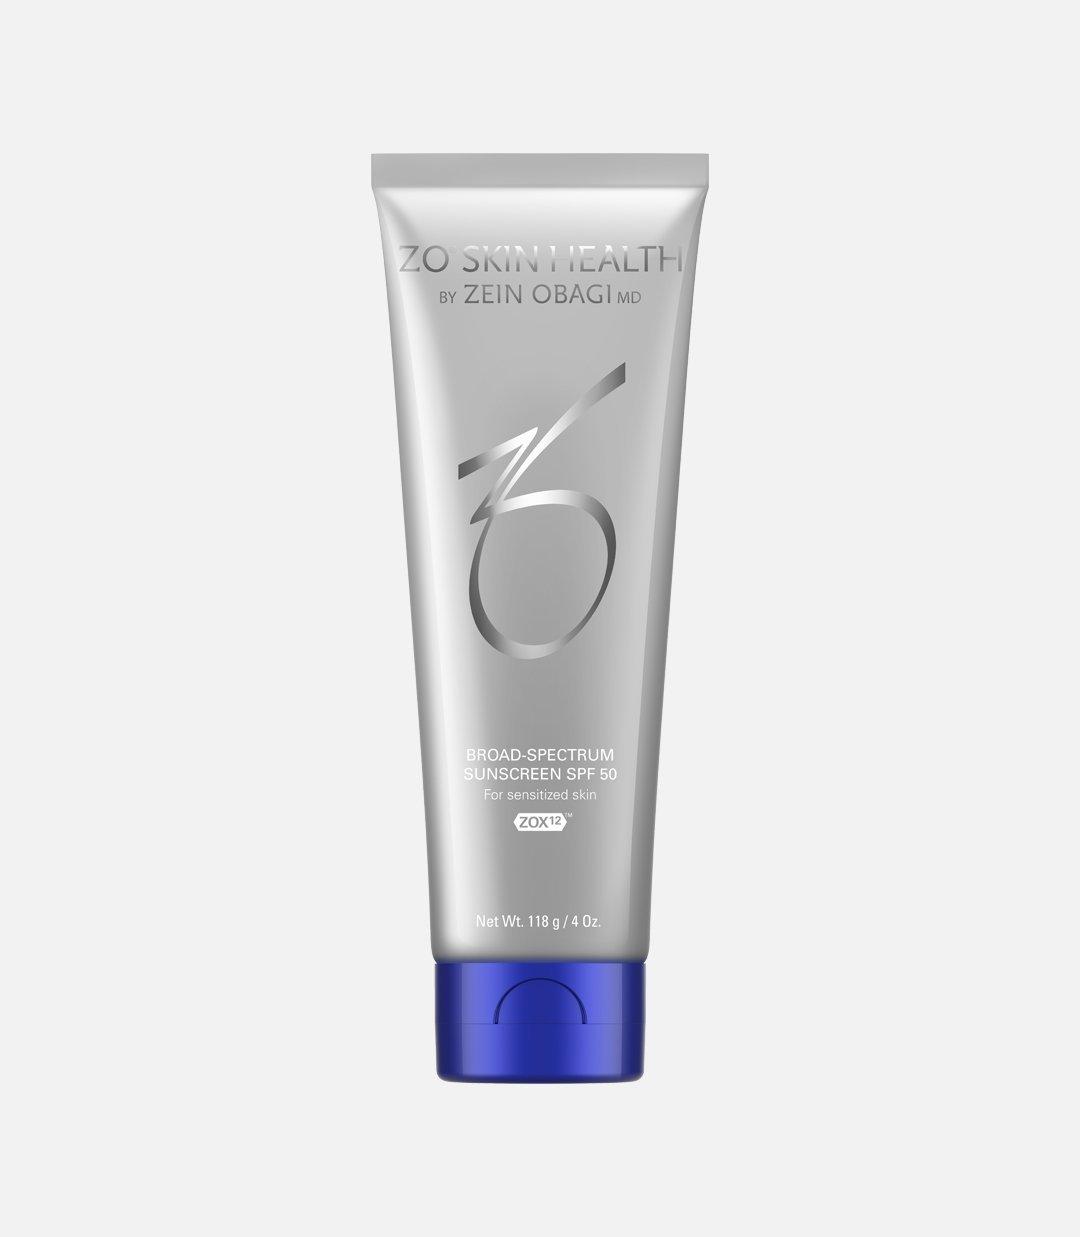 ZO Skin Health Broad Spectrum SPF 50